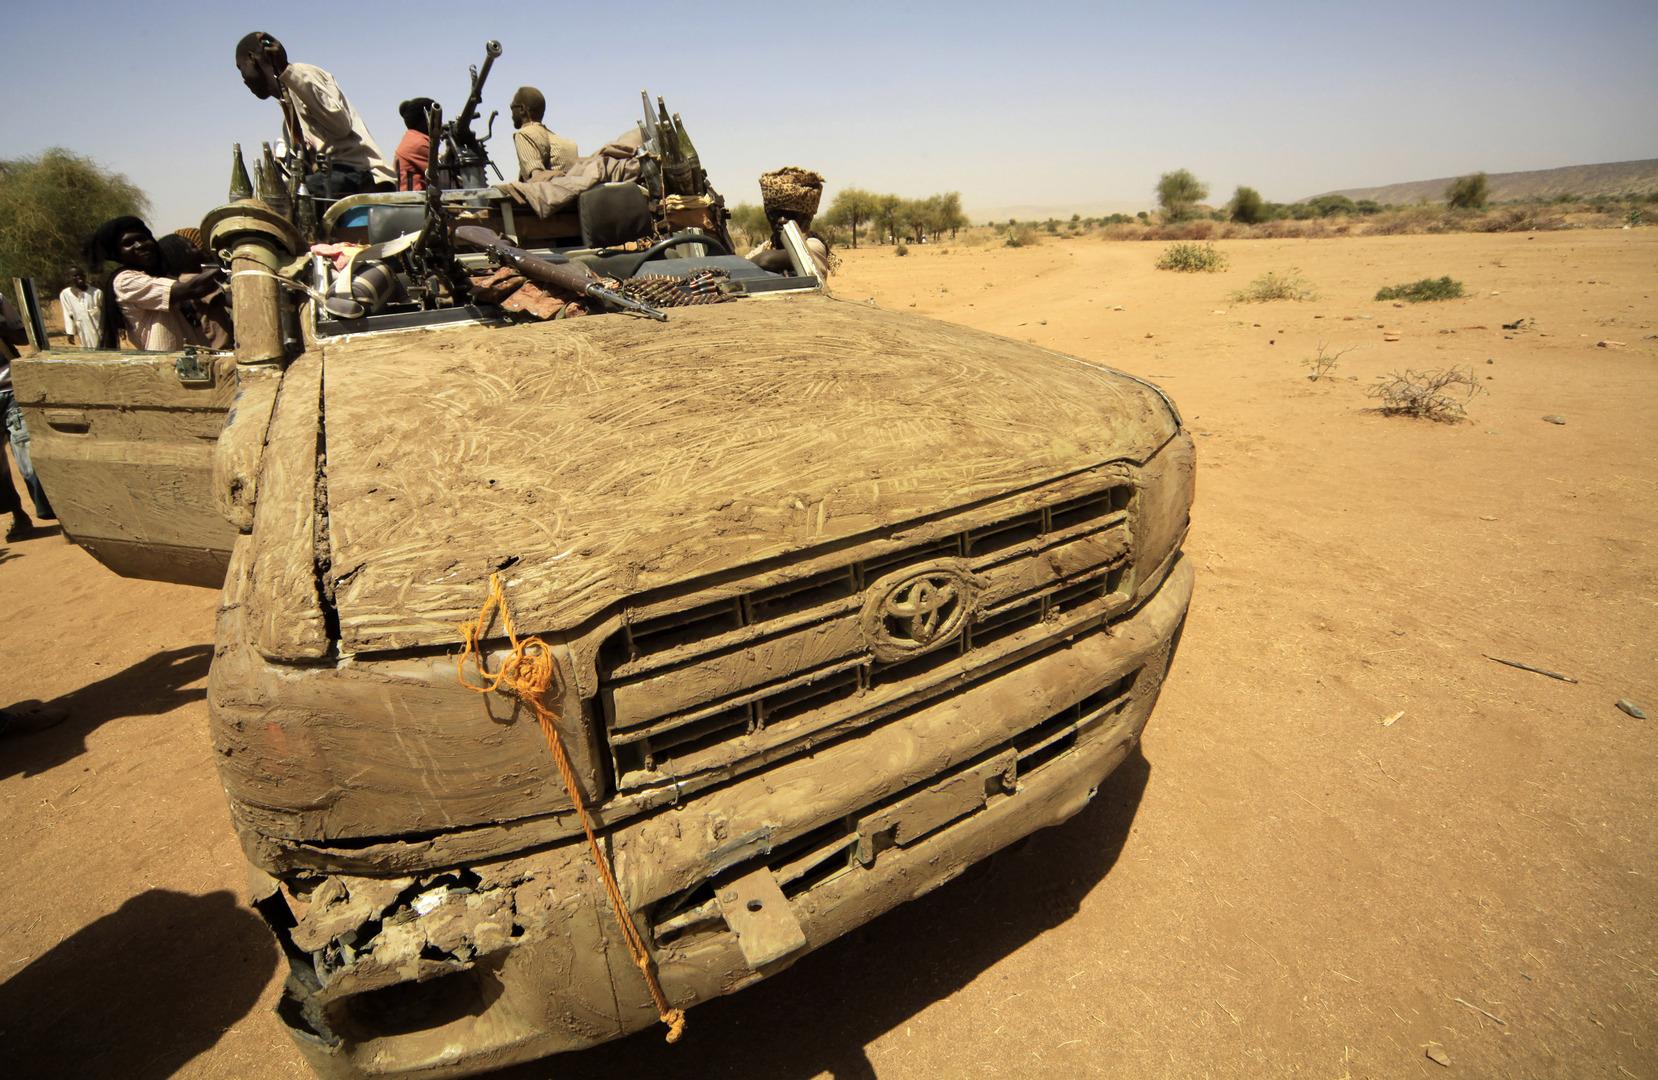 قتلى وجرحى باشتبكات في إقليم دارفور غربي السودان